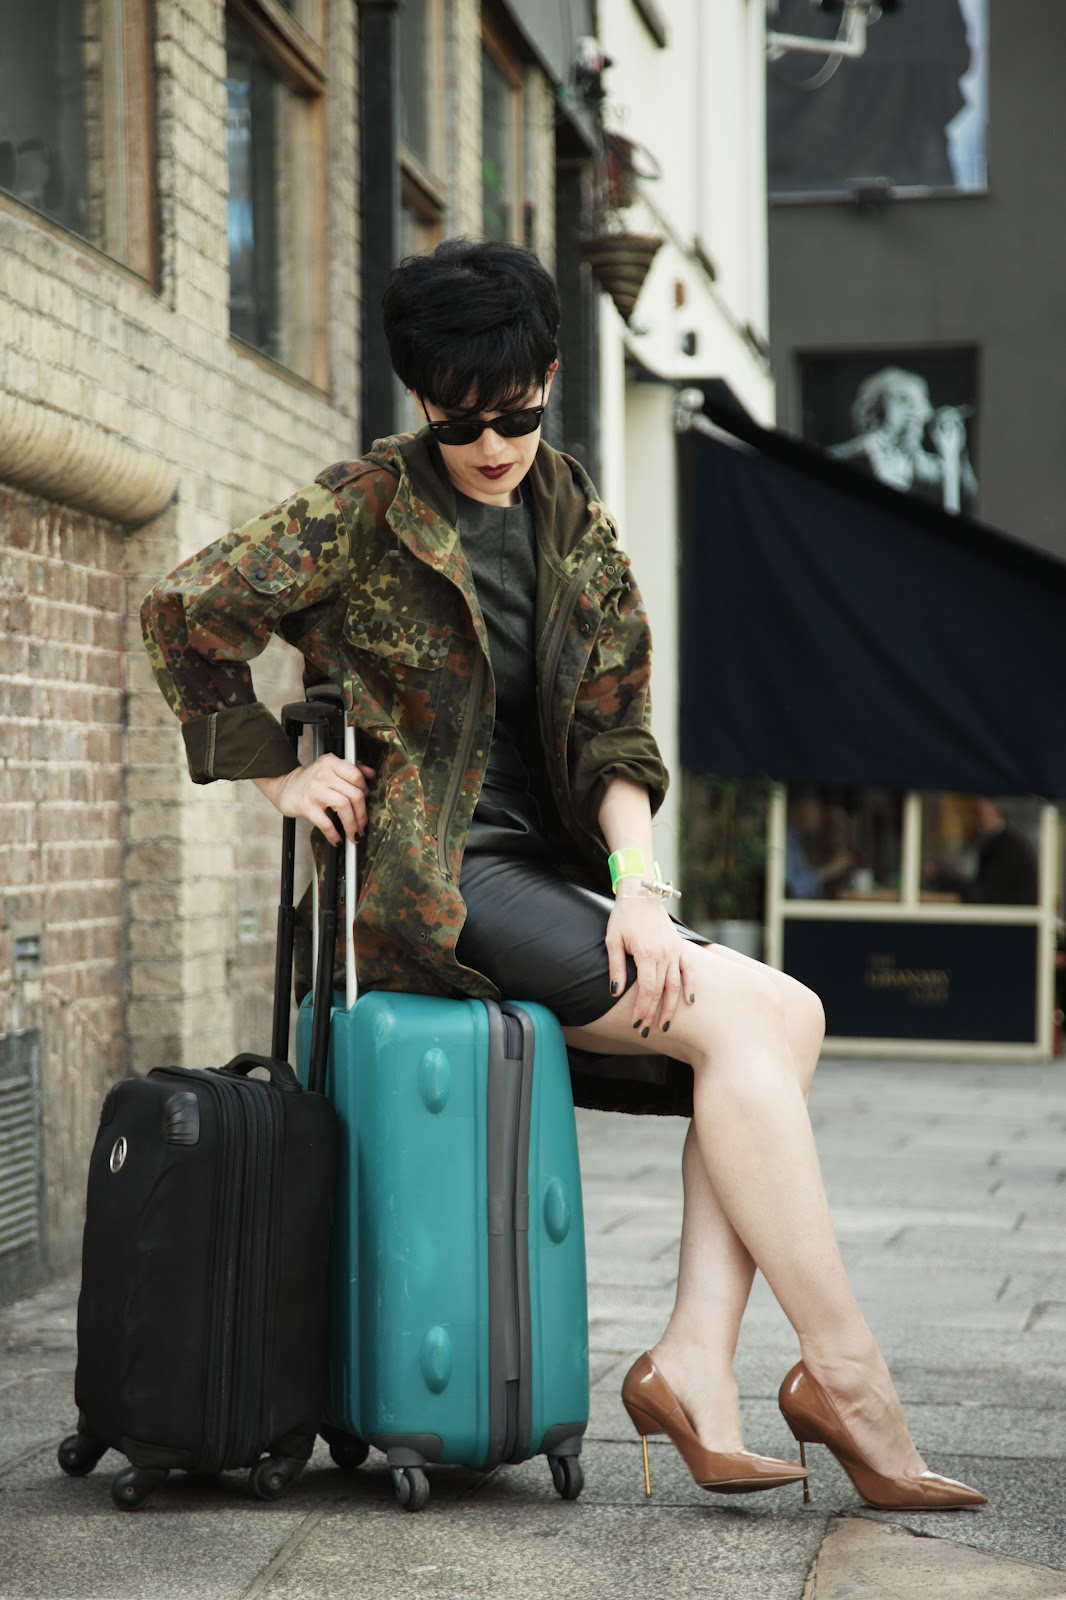 http://3.bp.blogspot.com/-CjQhPmxfJWE/UFRELZQL2CI/AAAAAAAAFtk/S5P385Qv5JU/s1600/mb+heels+02.JPG